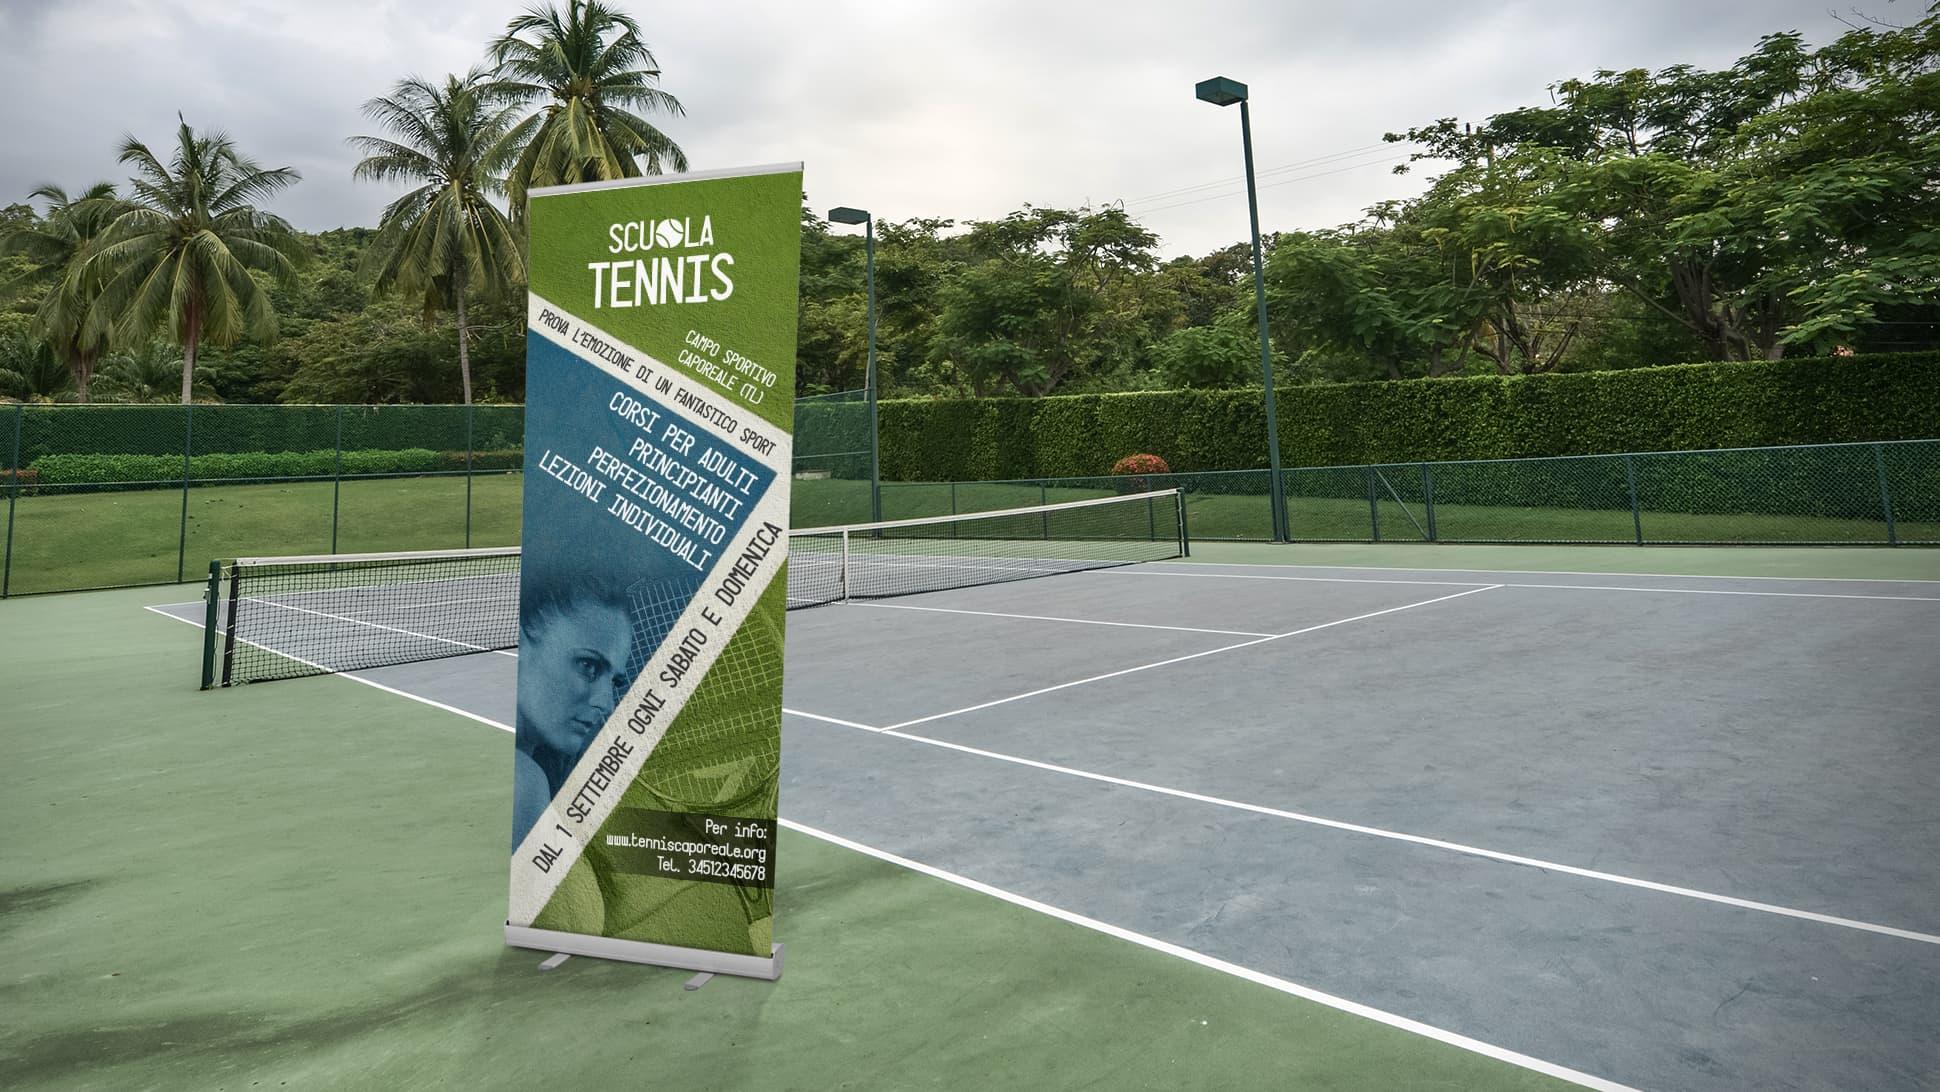 Roll Up Plus a tema sport corsi tennis | tictac.it